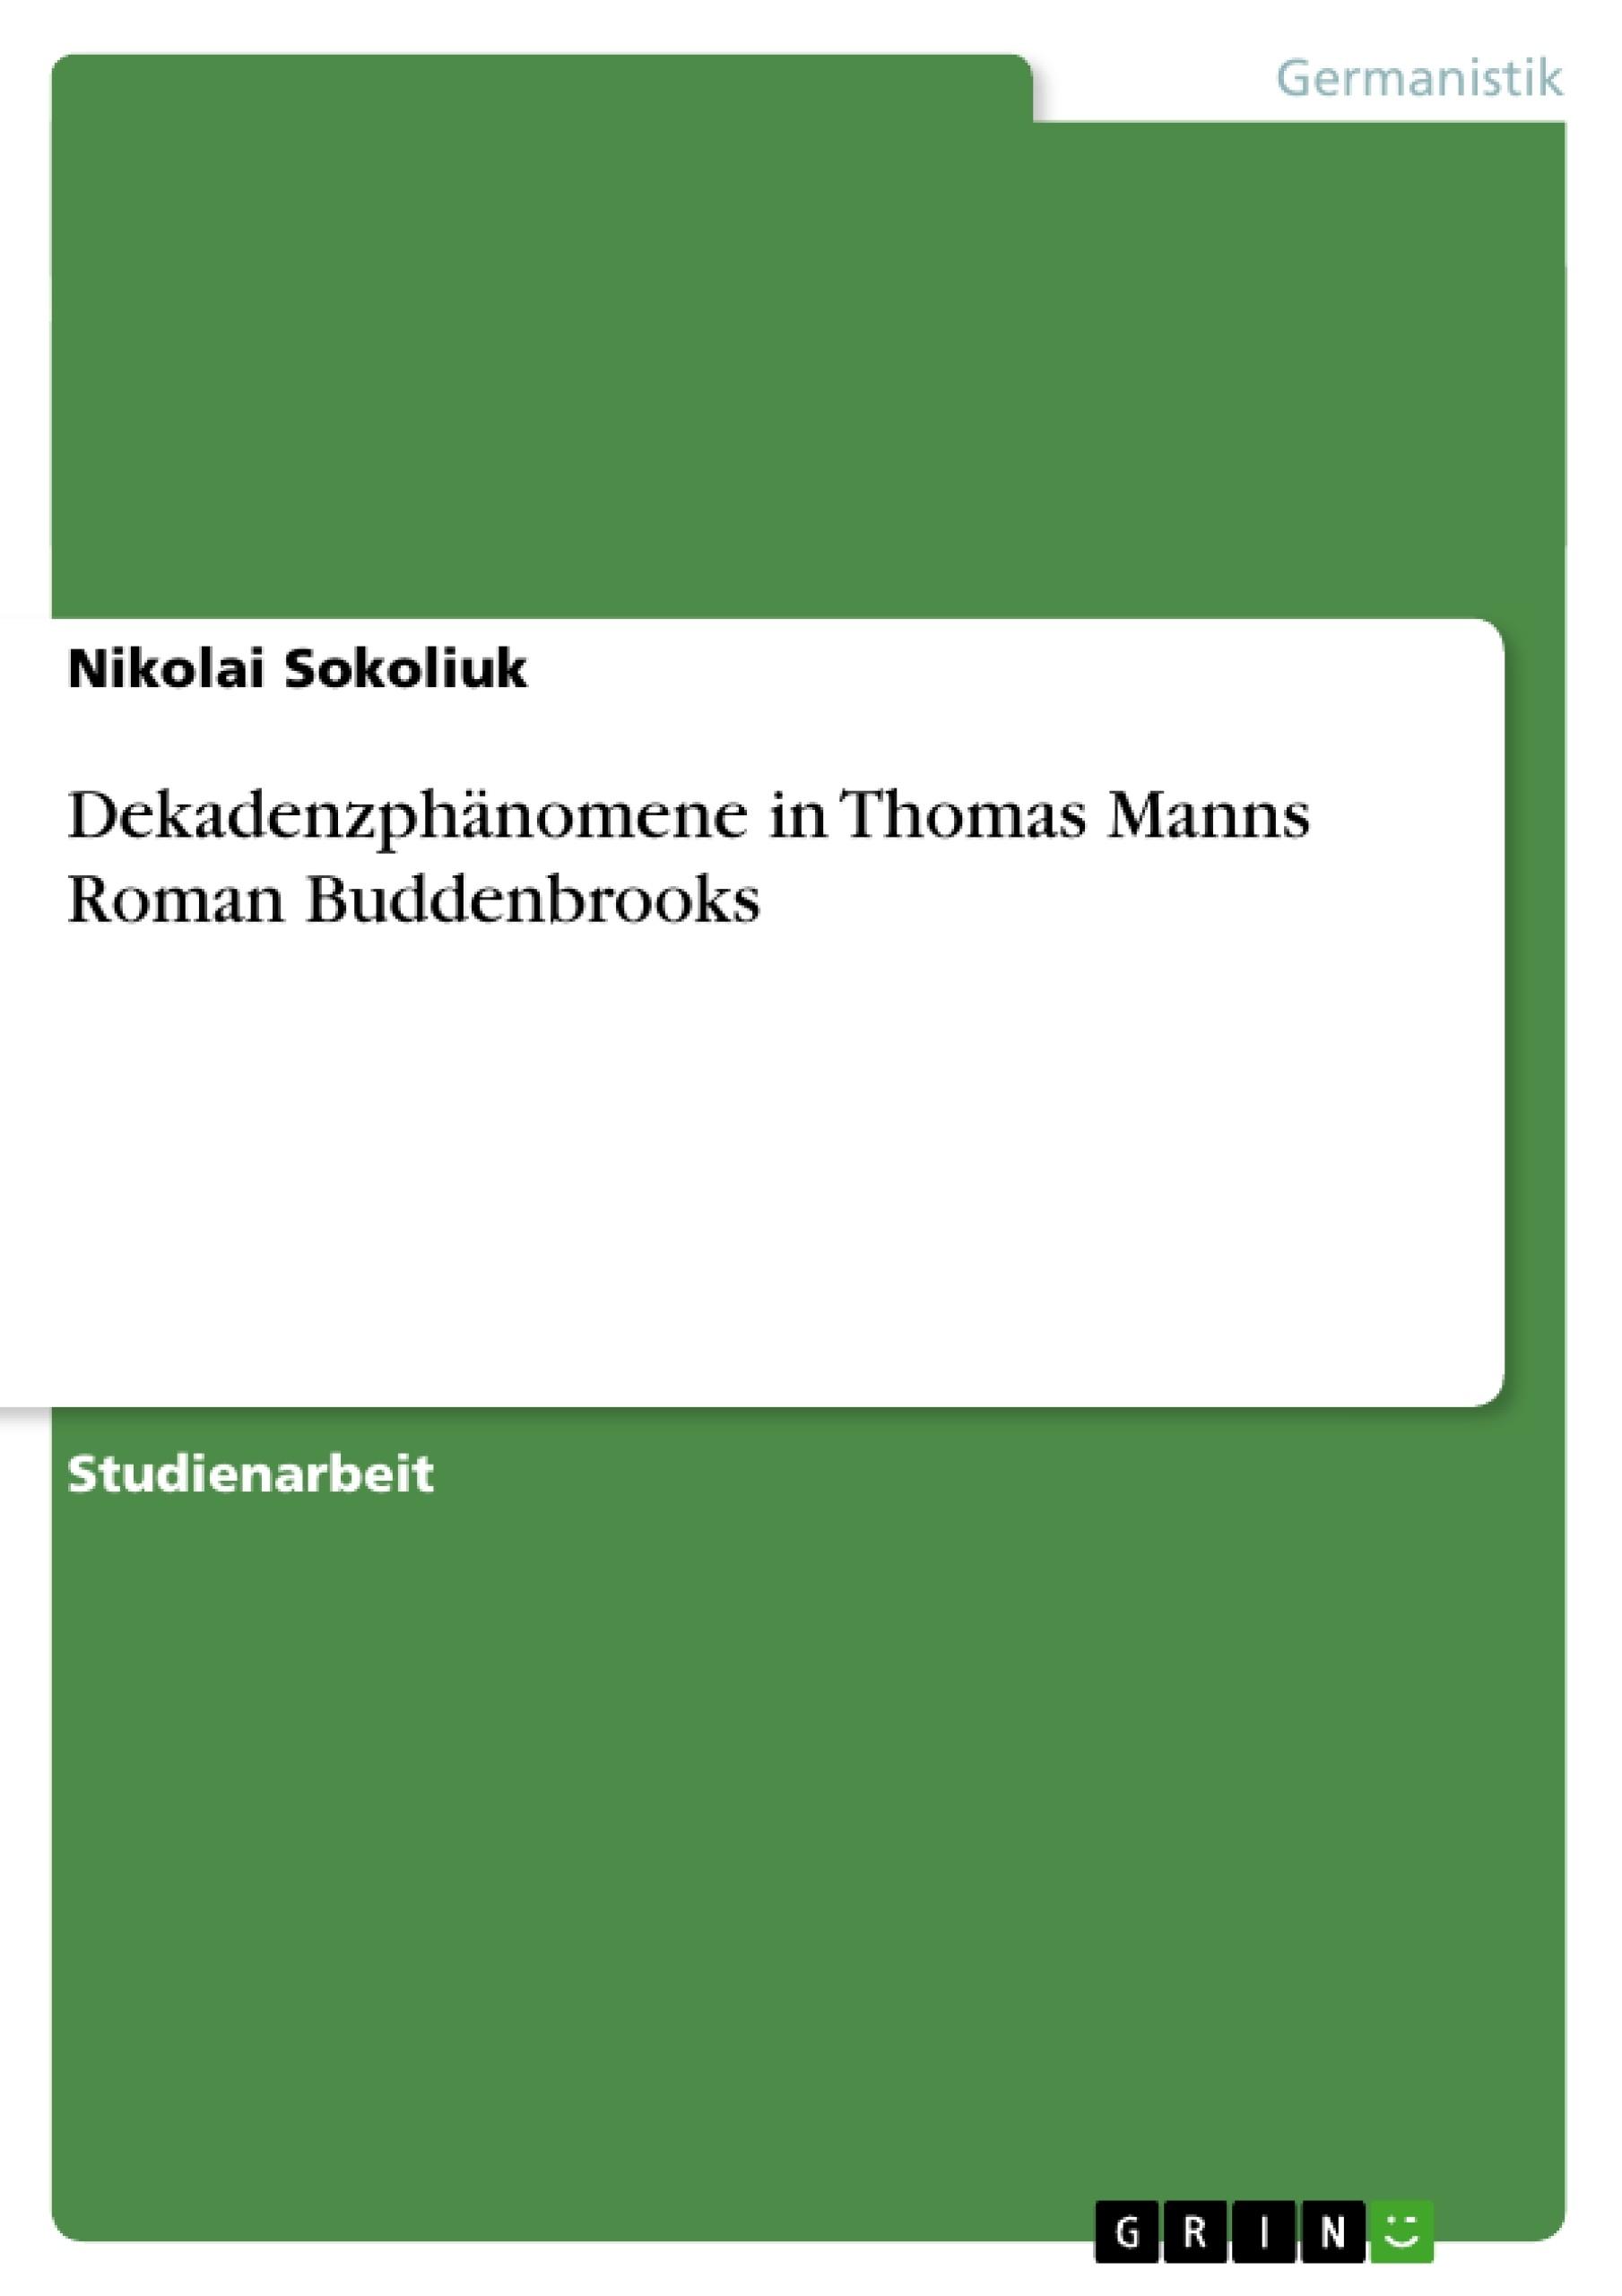 Titel: Dekadenzphänomene in Thomas Manns Roman Buddenbrooks